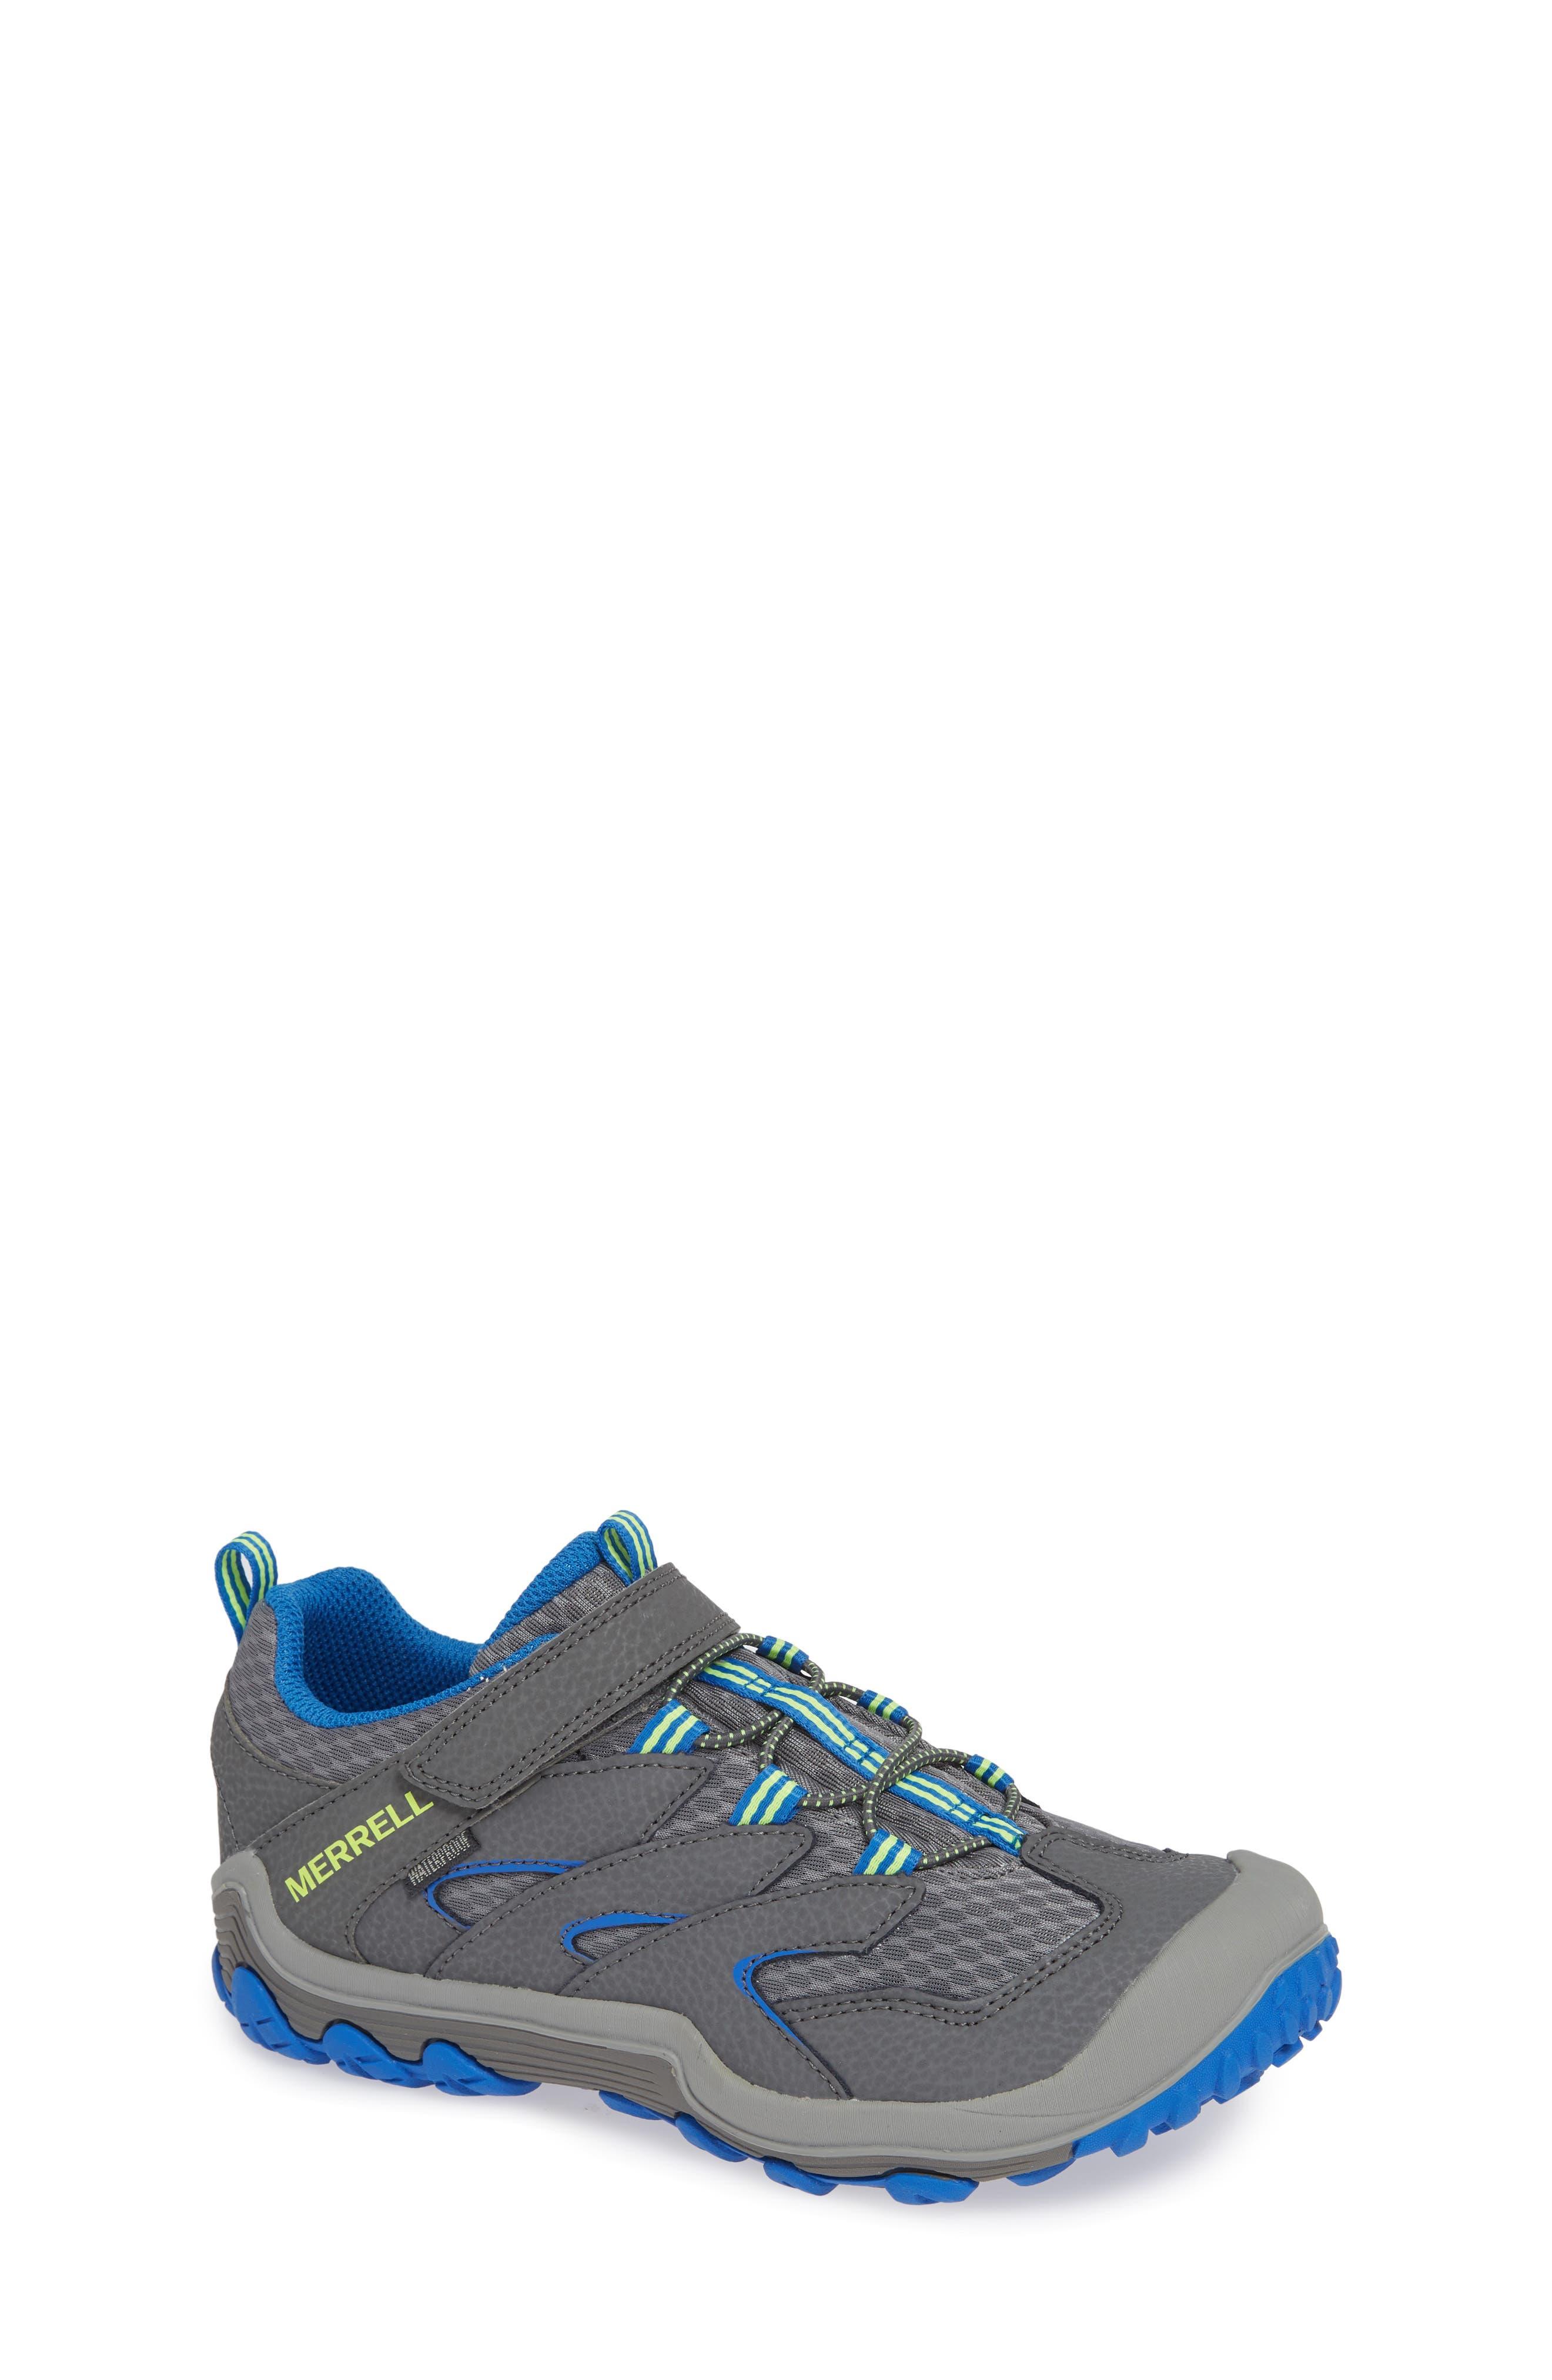 Girls Merrell Chameleon 7 Waterproof Sneaker Size 15 M  Grey